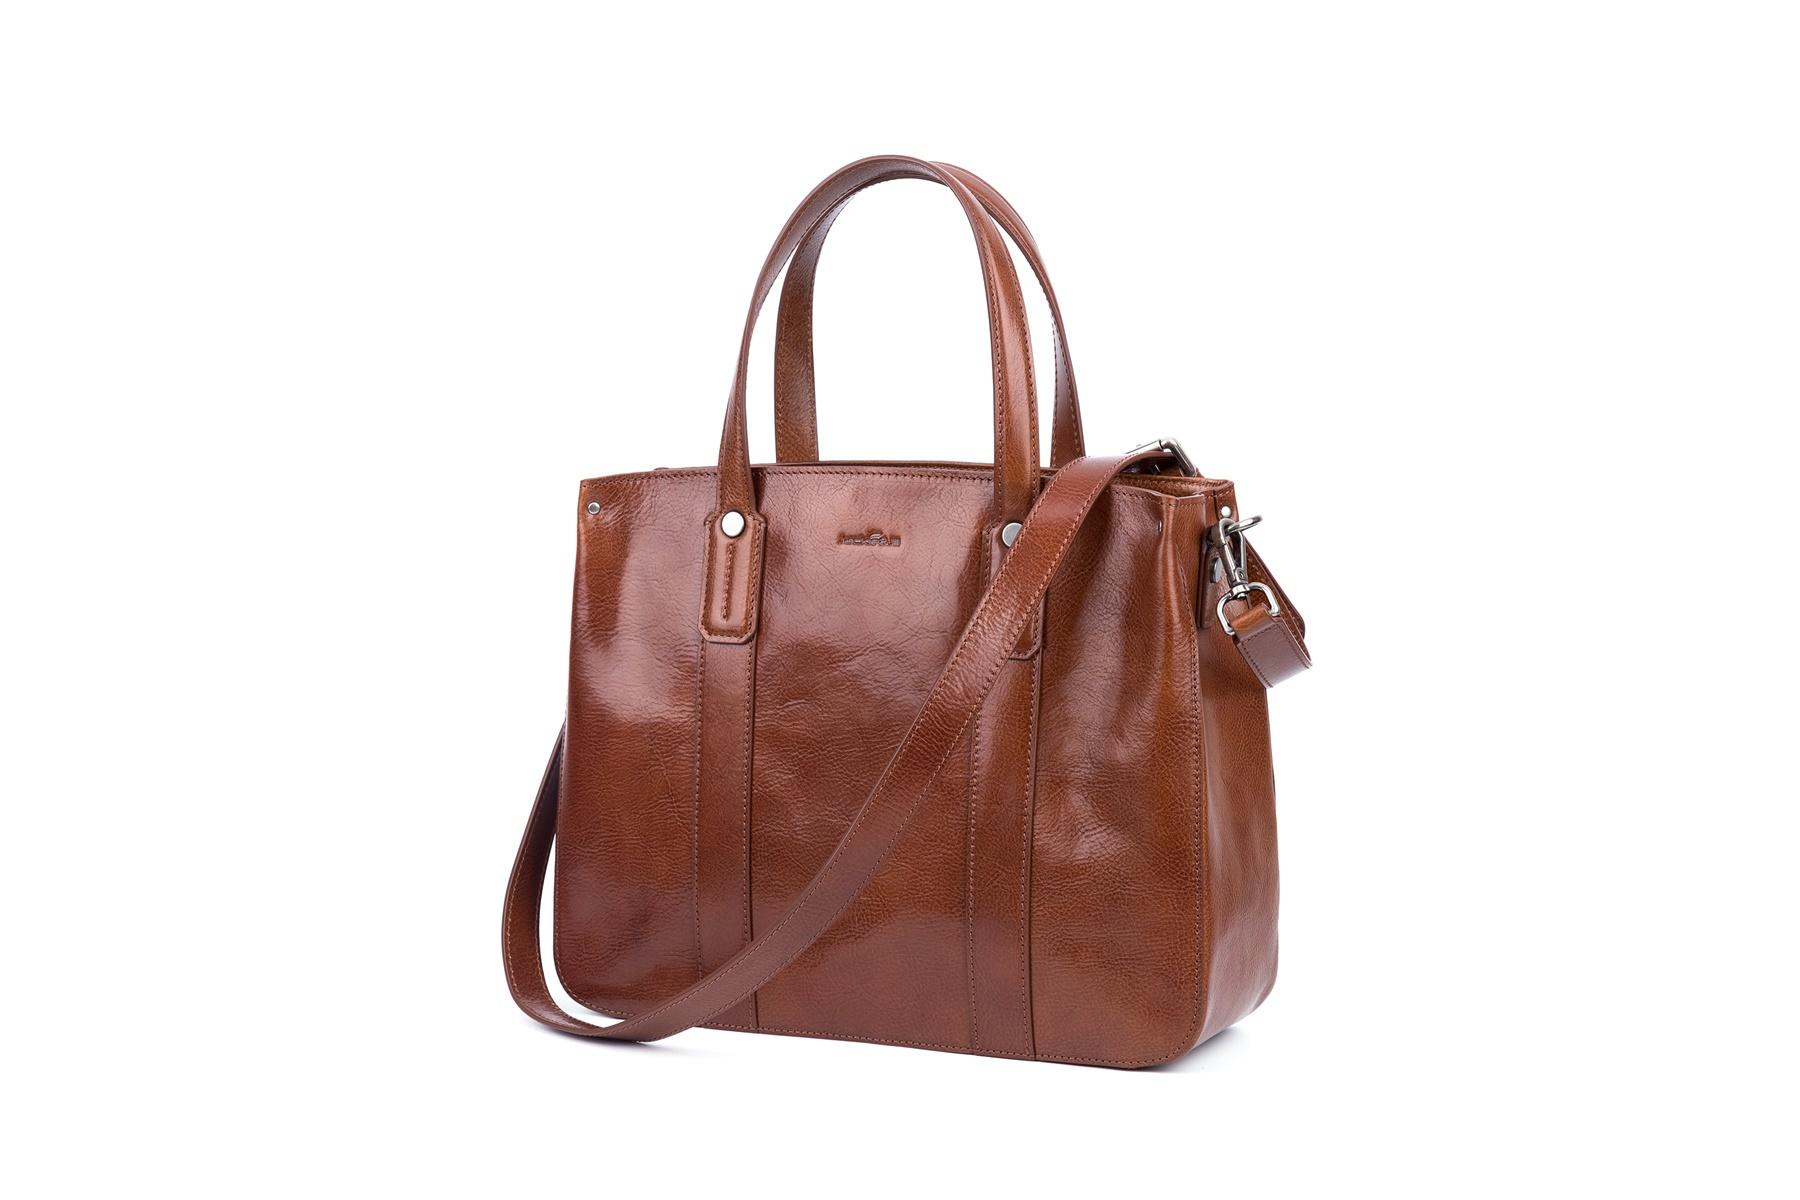 GF bags-Latest Handbags | Handbag Top Handle Waxed Leather Zipper Close Bag - Gaofeng-7